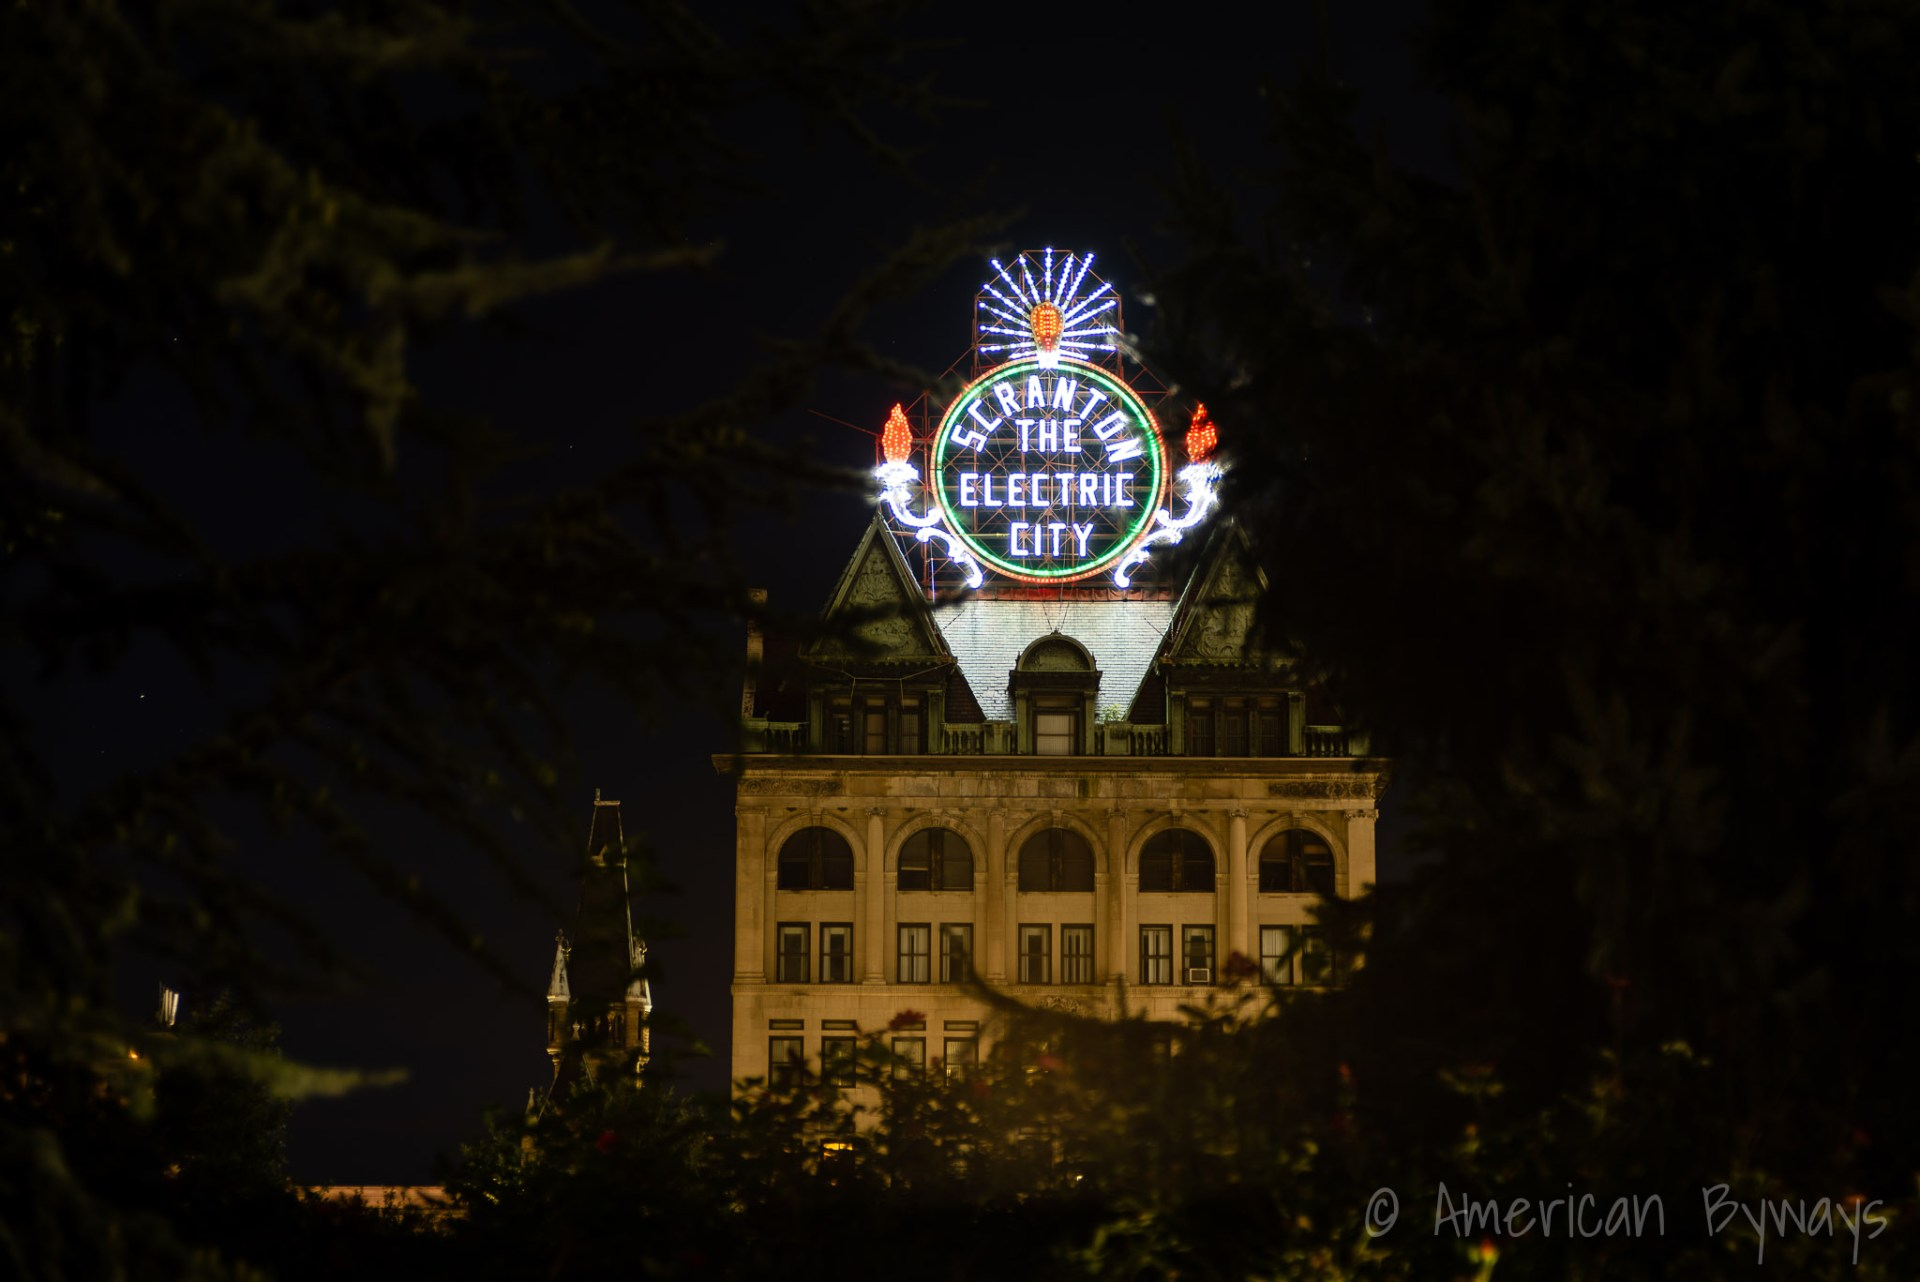 Scranton, the Electric City Sign